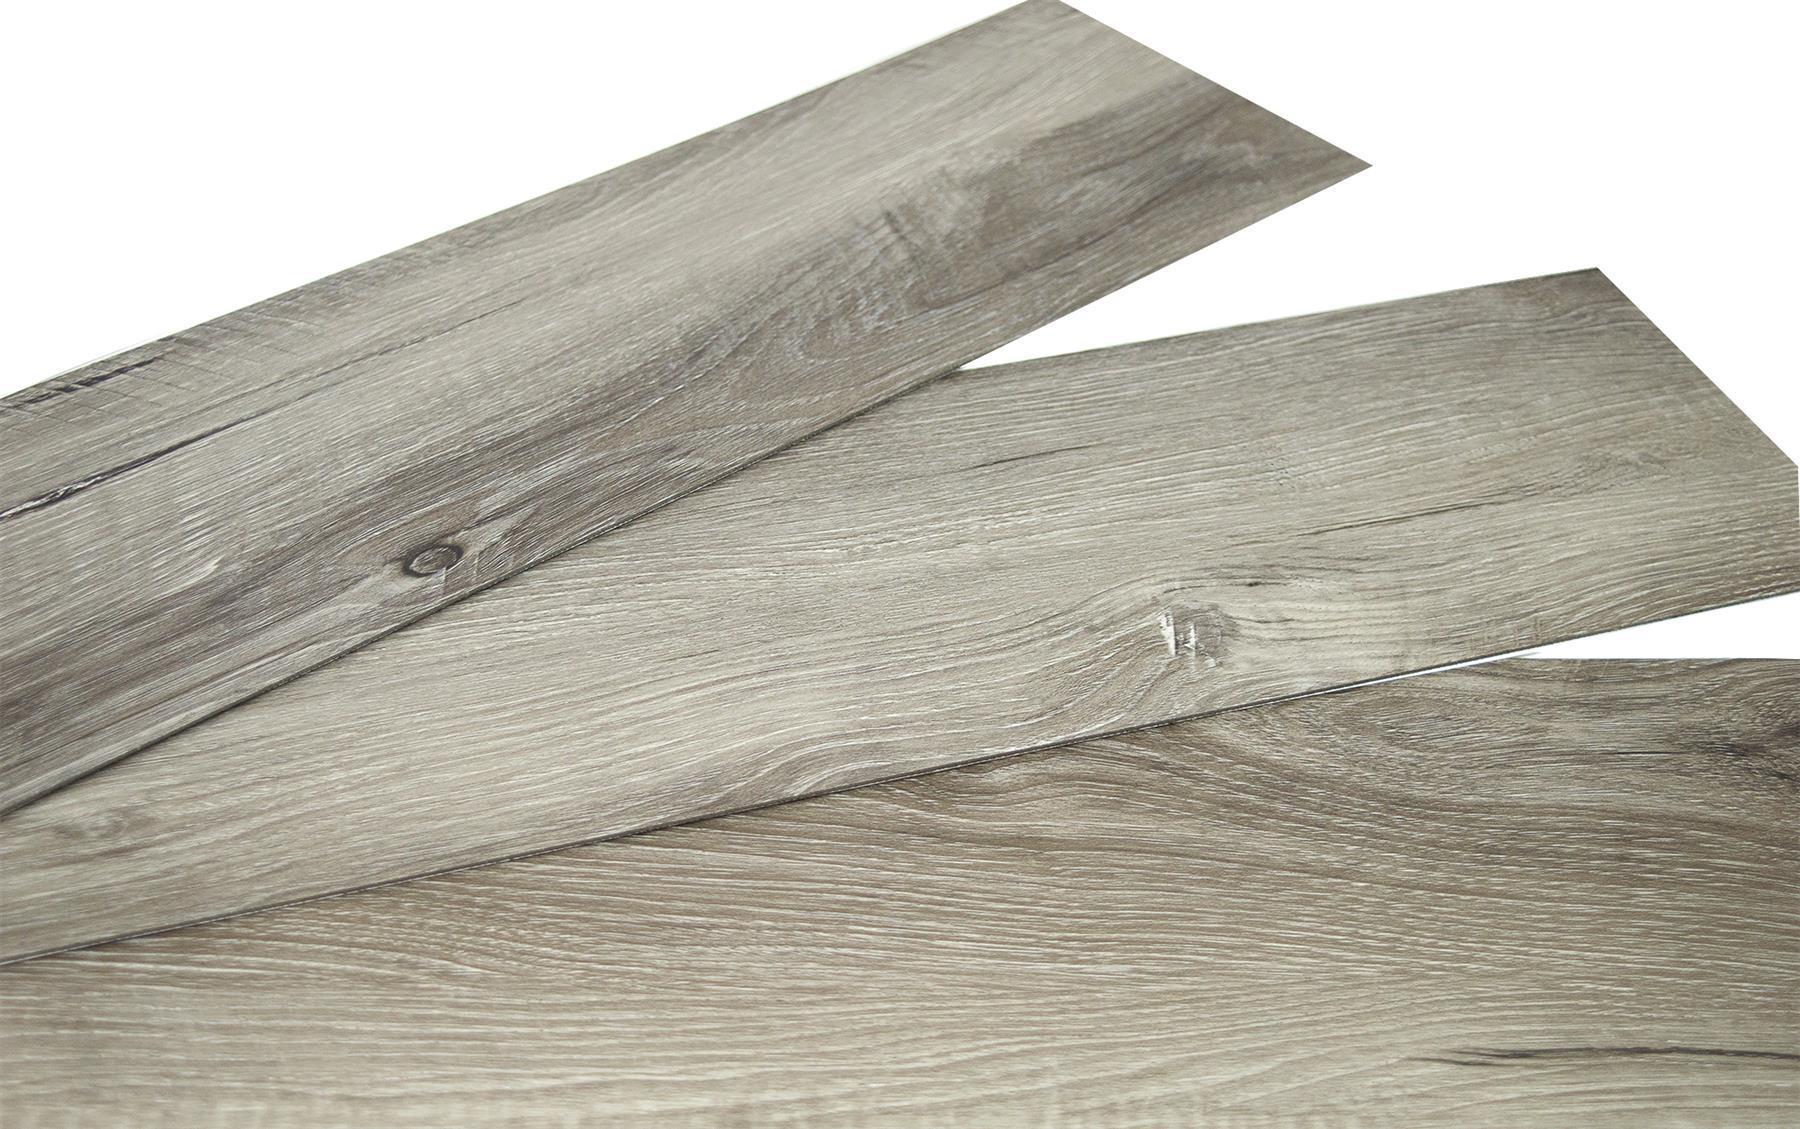 thumbnail 7 - Floor Planks Tiles Self Adhesive Dark Grey Wood Vinyl Flooring Kitchen Bathroom